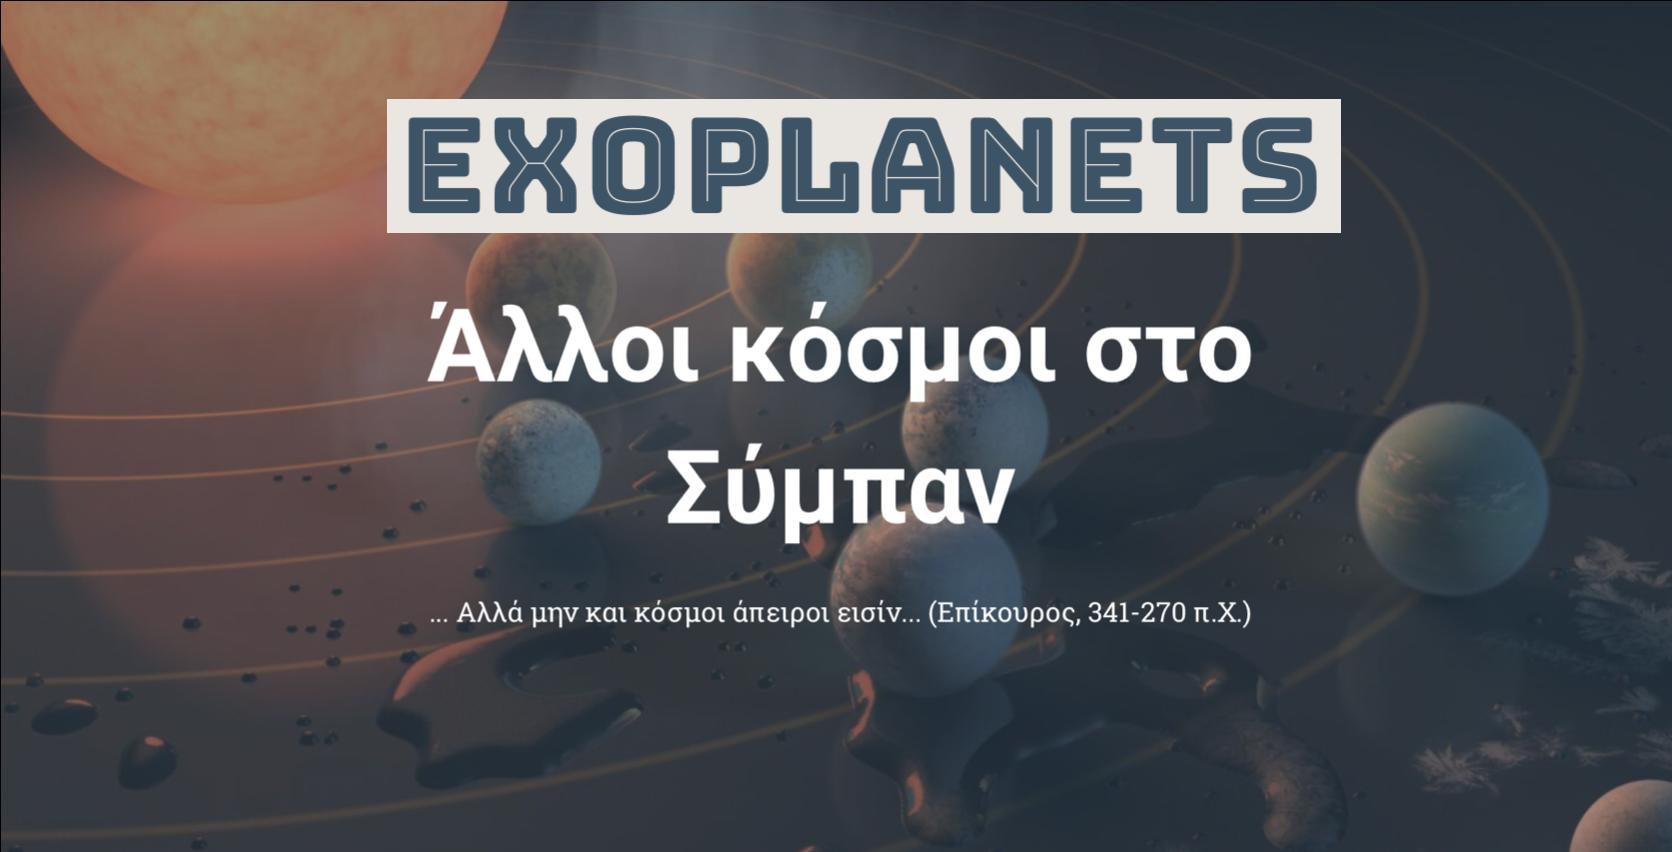 EXOPLANETS.GR – Νέος Ελληνικός ιστοχώρος για Εξωπλανήτες